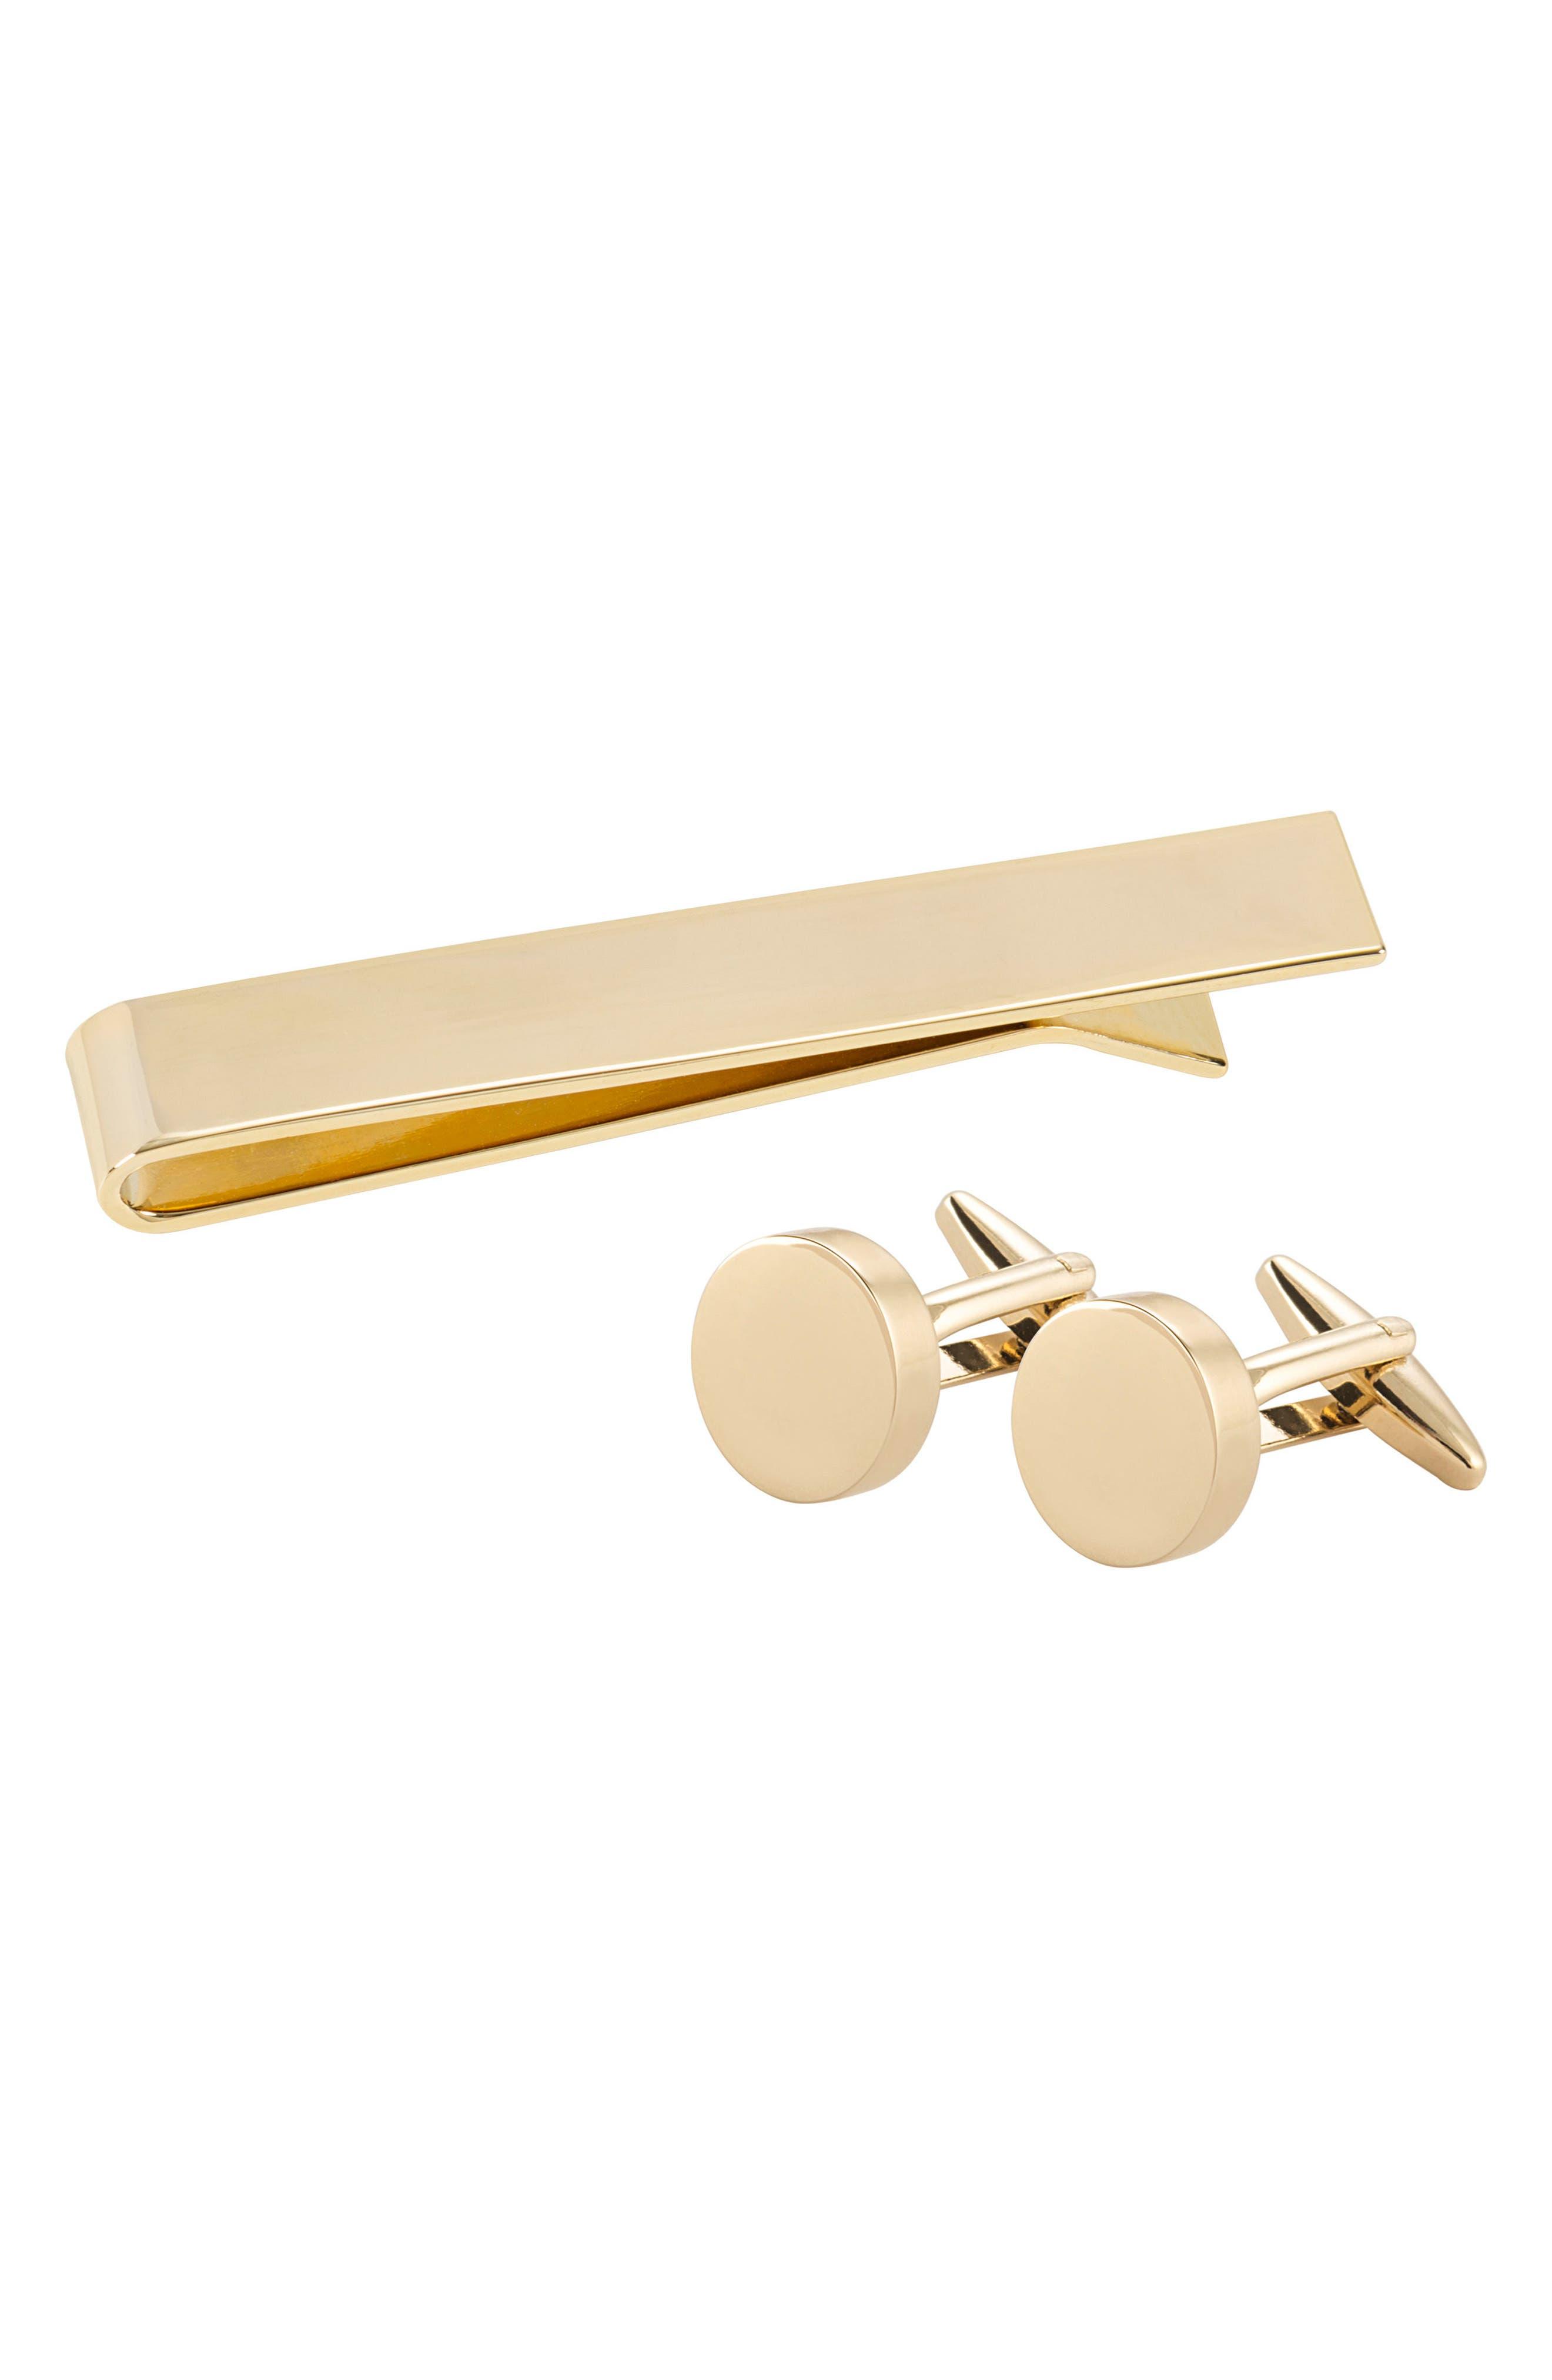 Monogram Cuff Links & Tie Bar Set,                             Main thumbnail 1, color,                             Gold